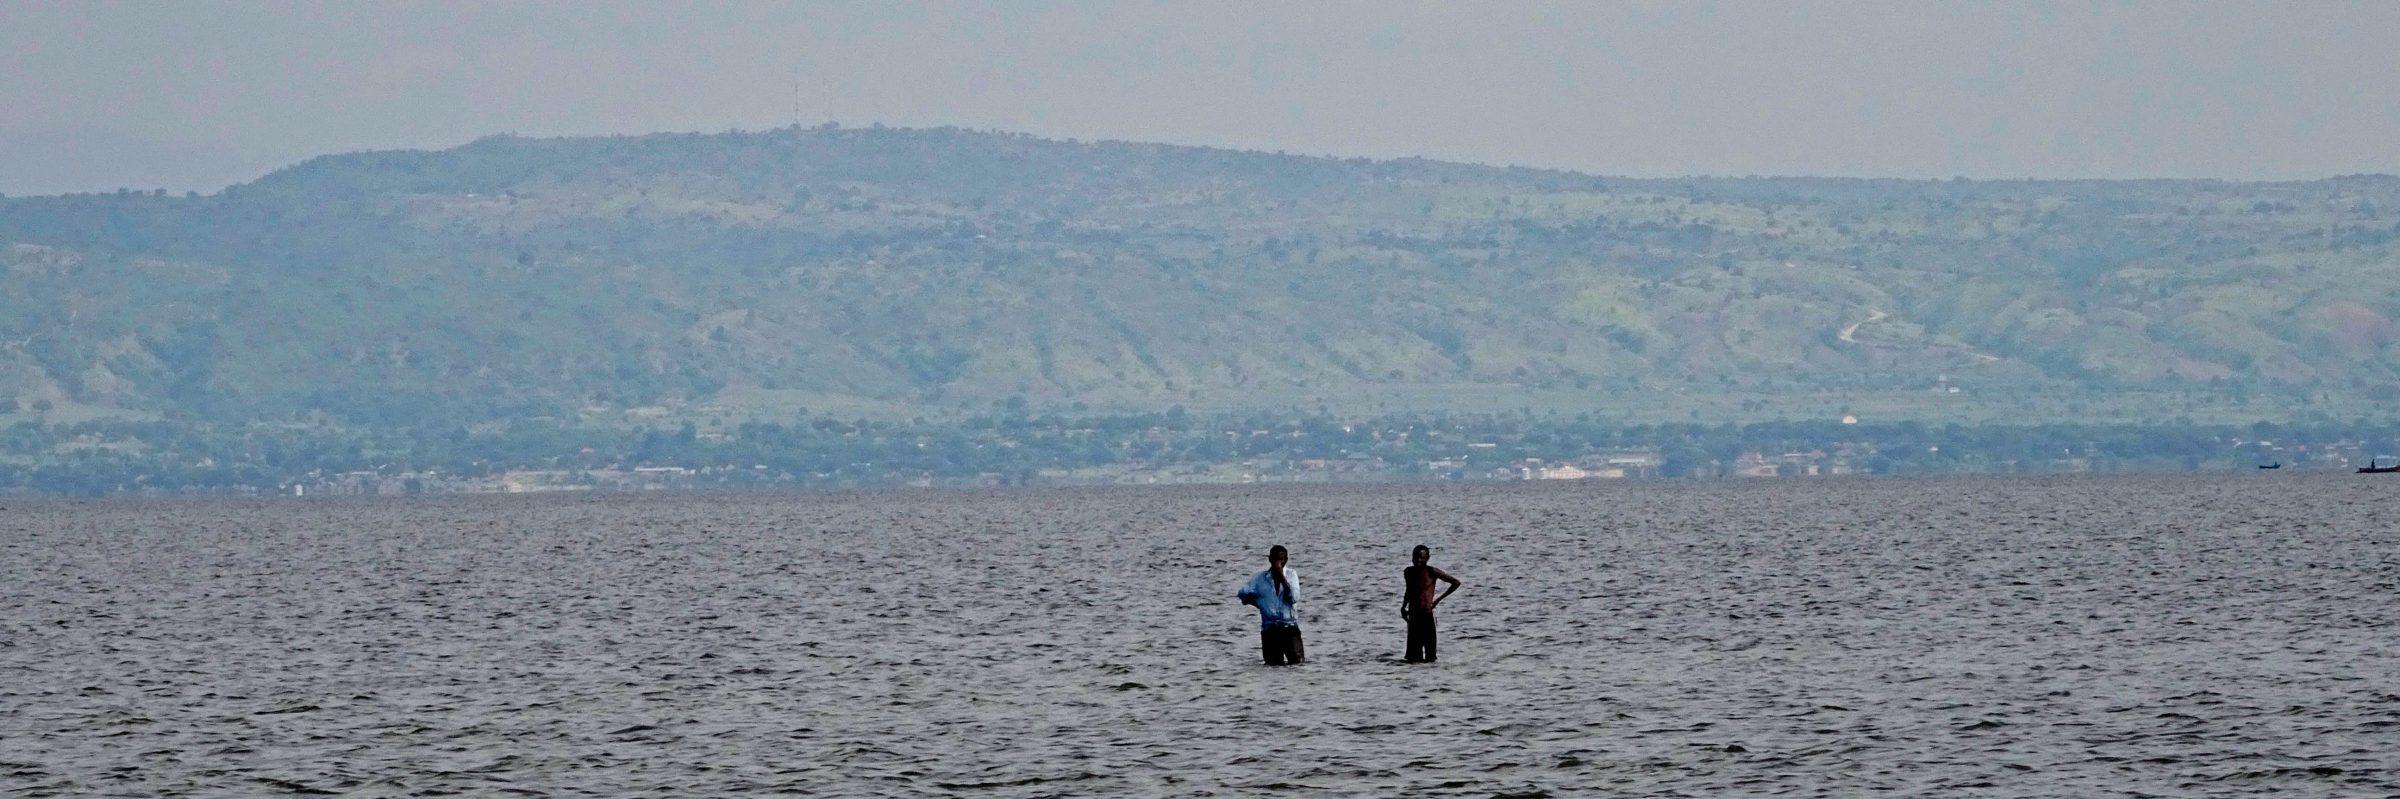 Congolese vissers in Lake Albert